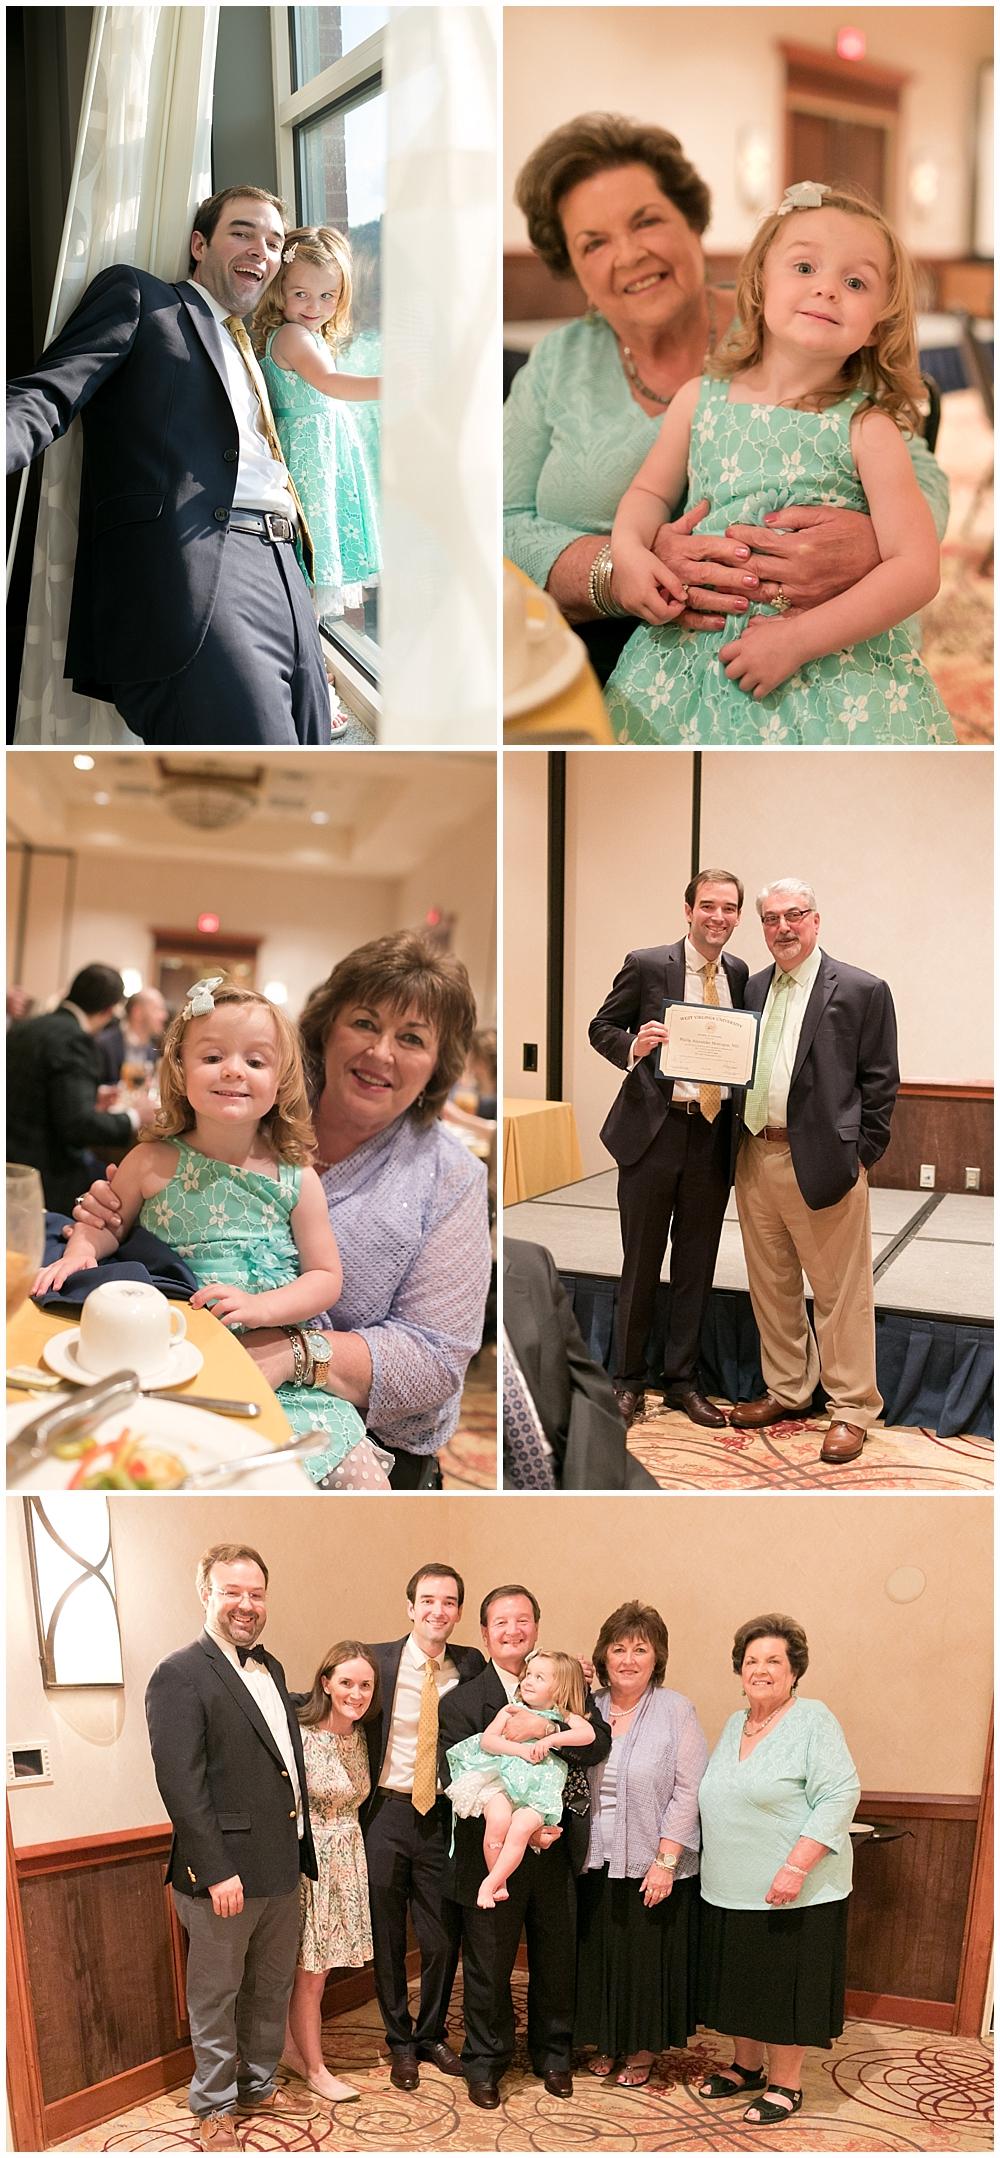 family celebrating medical residency graduation at banquet